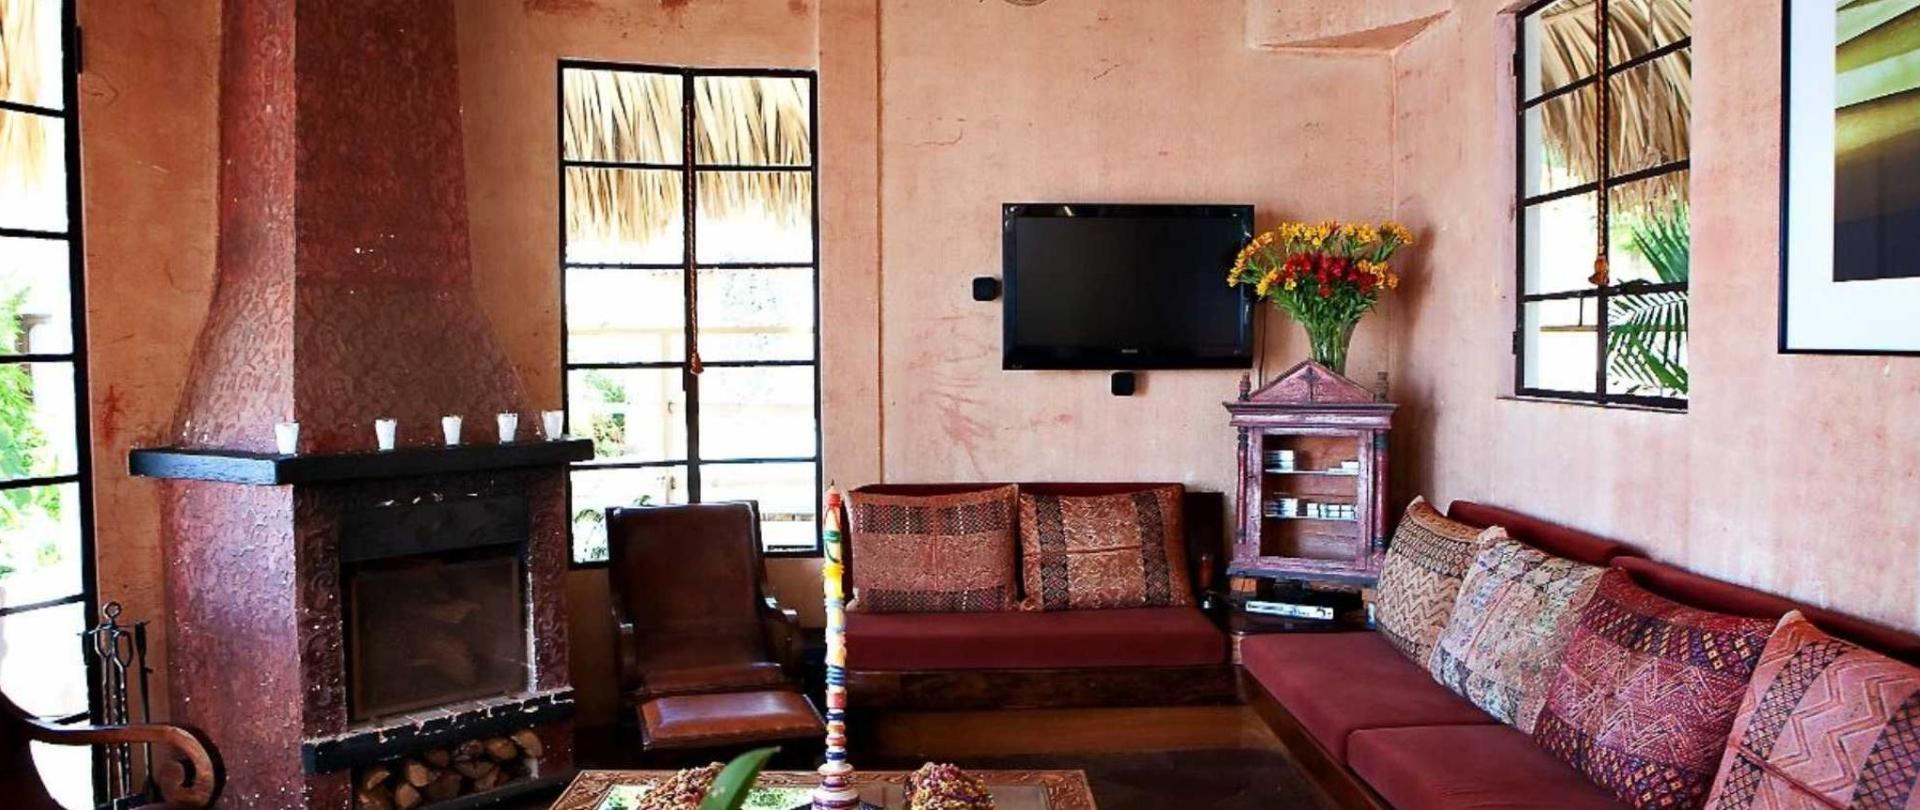 living-room1.jpg.1920x807_default.jpg